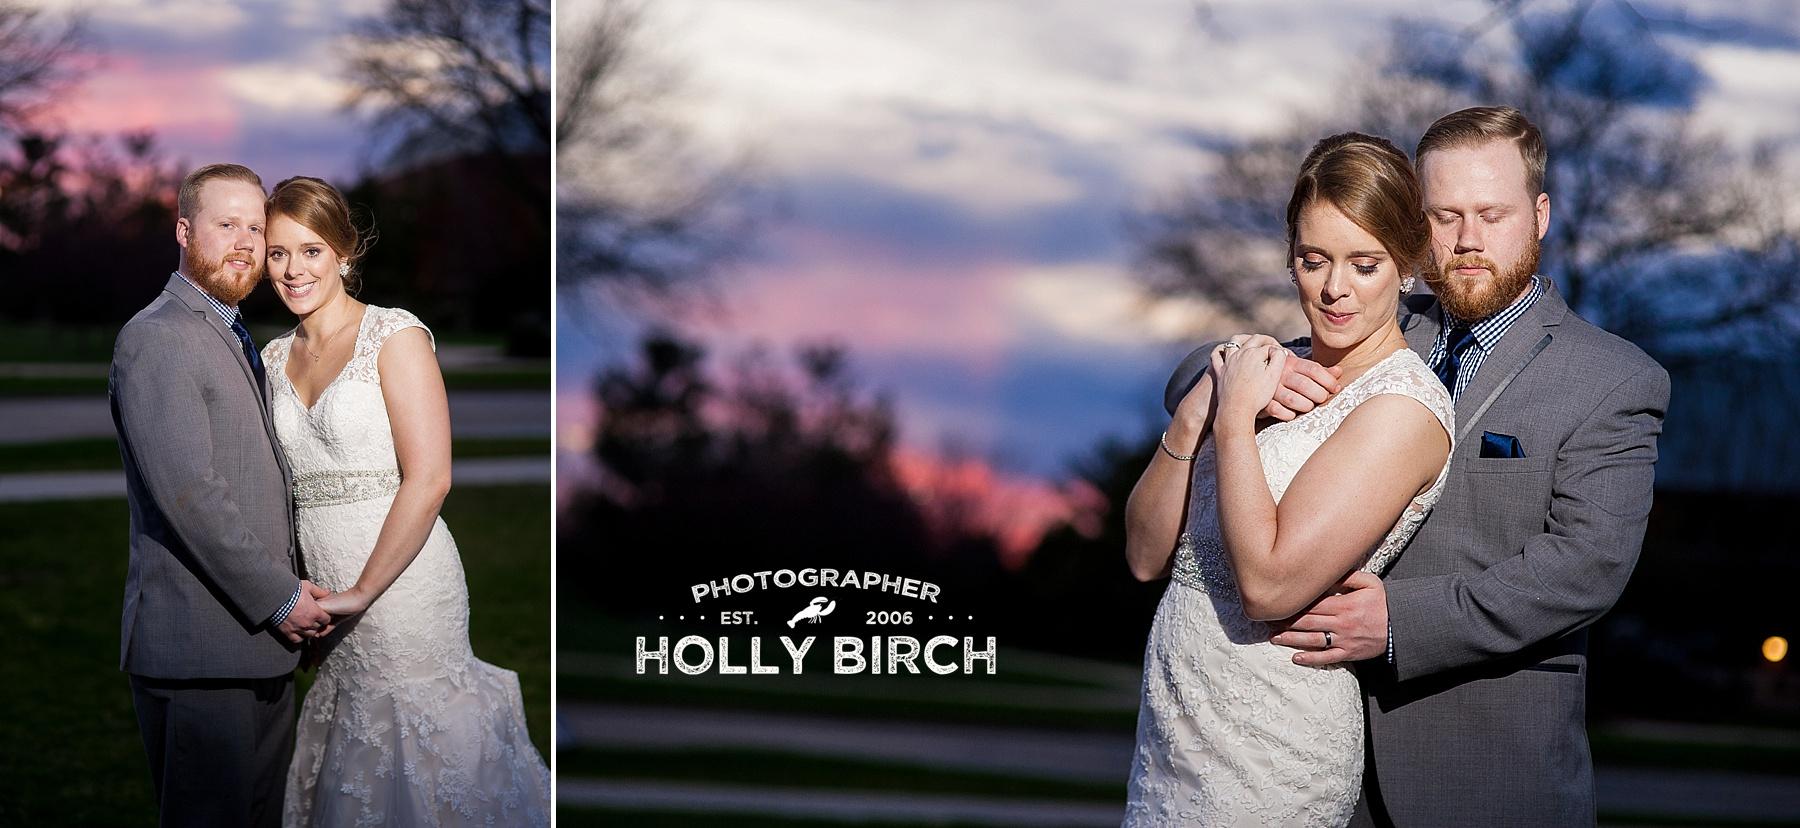 classic winter sunset at iHotel wedding